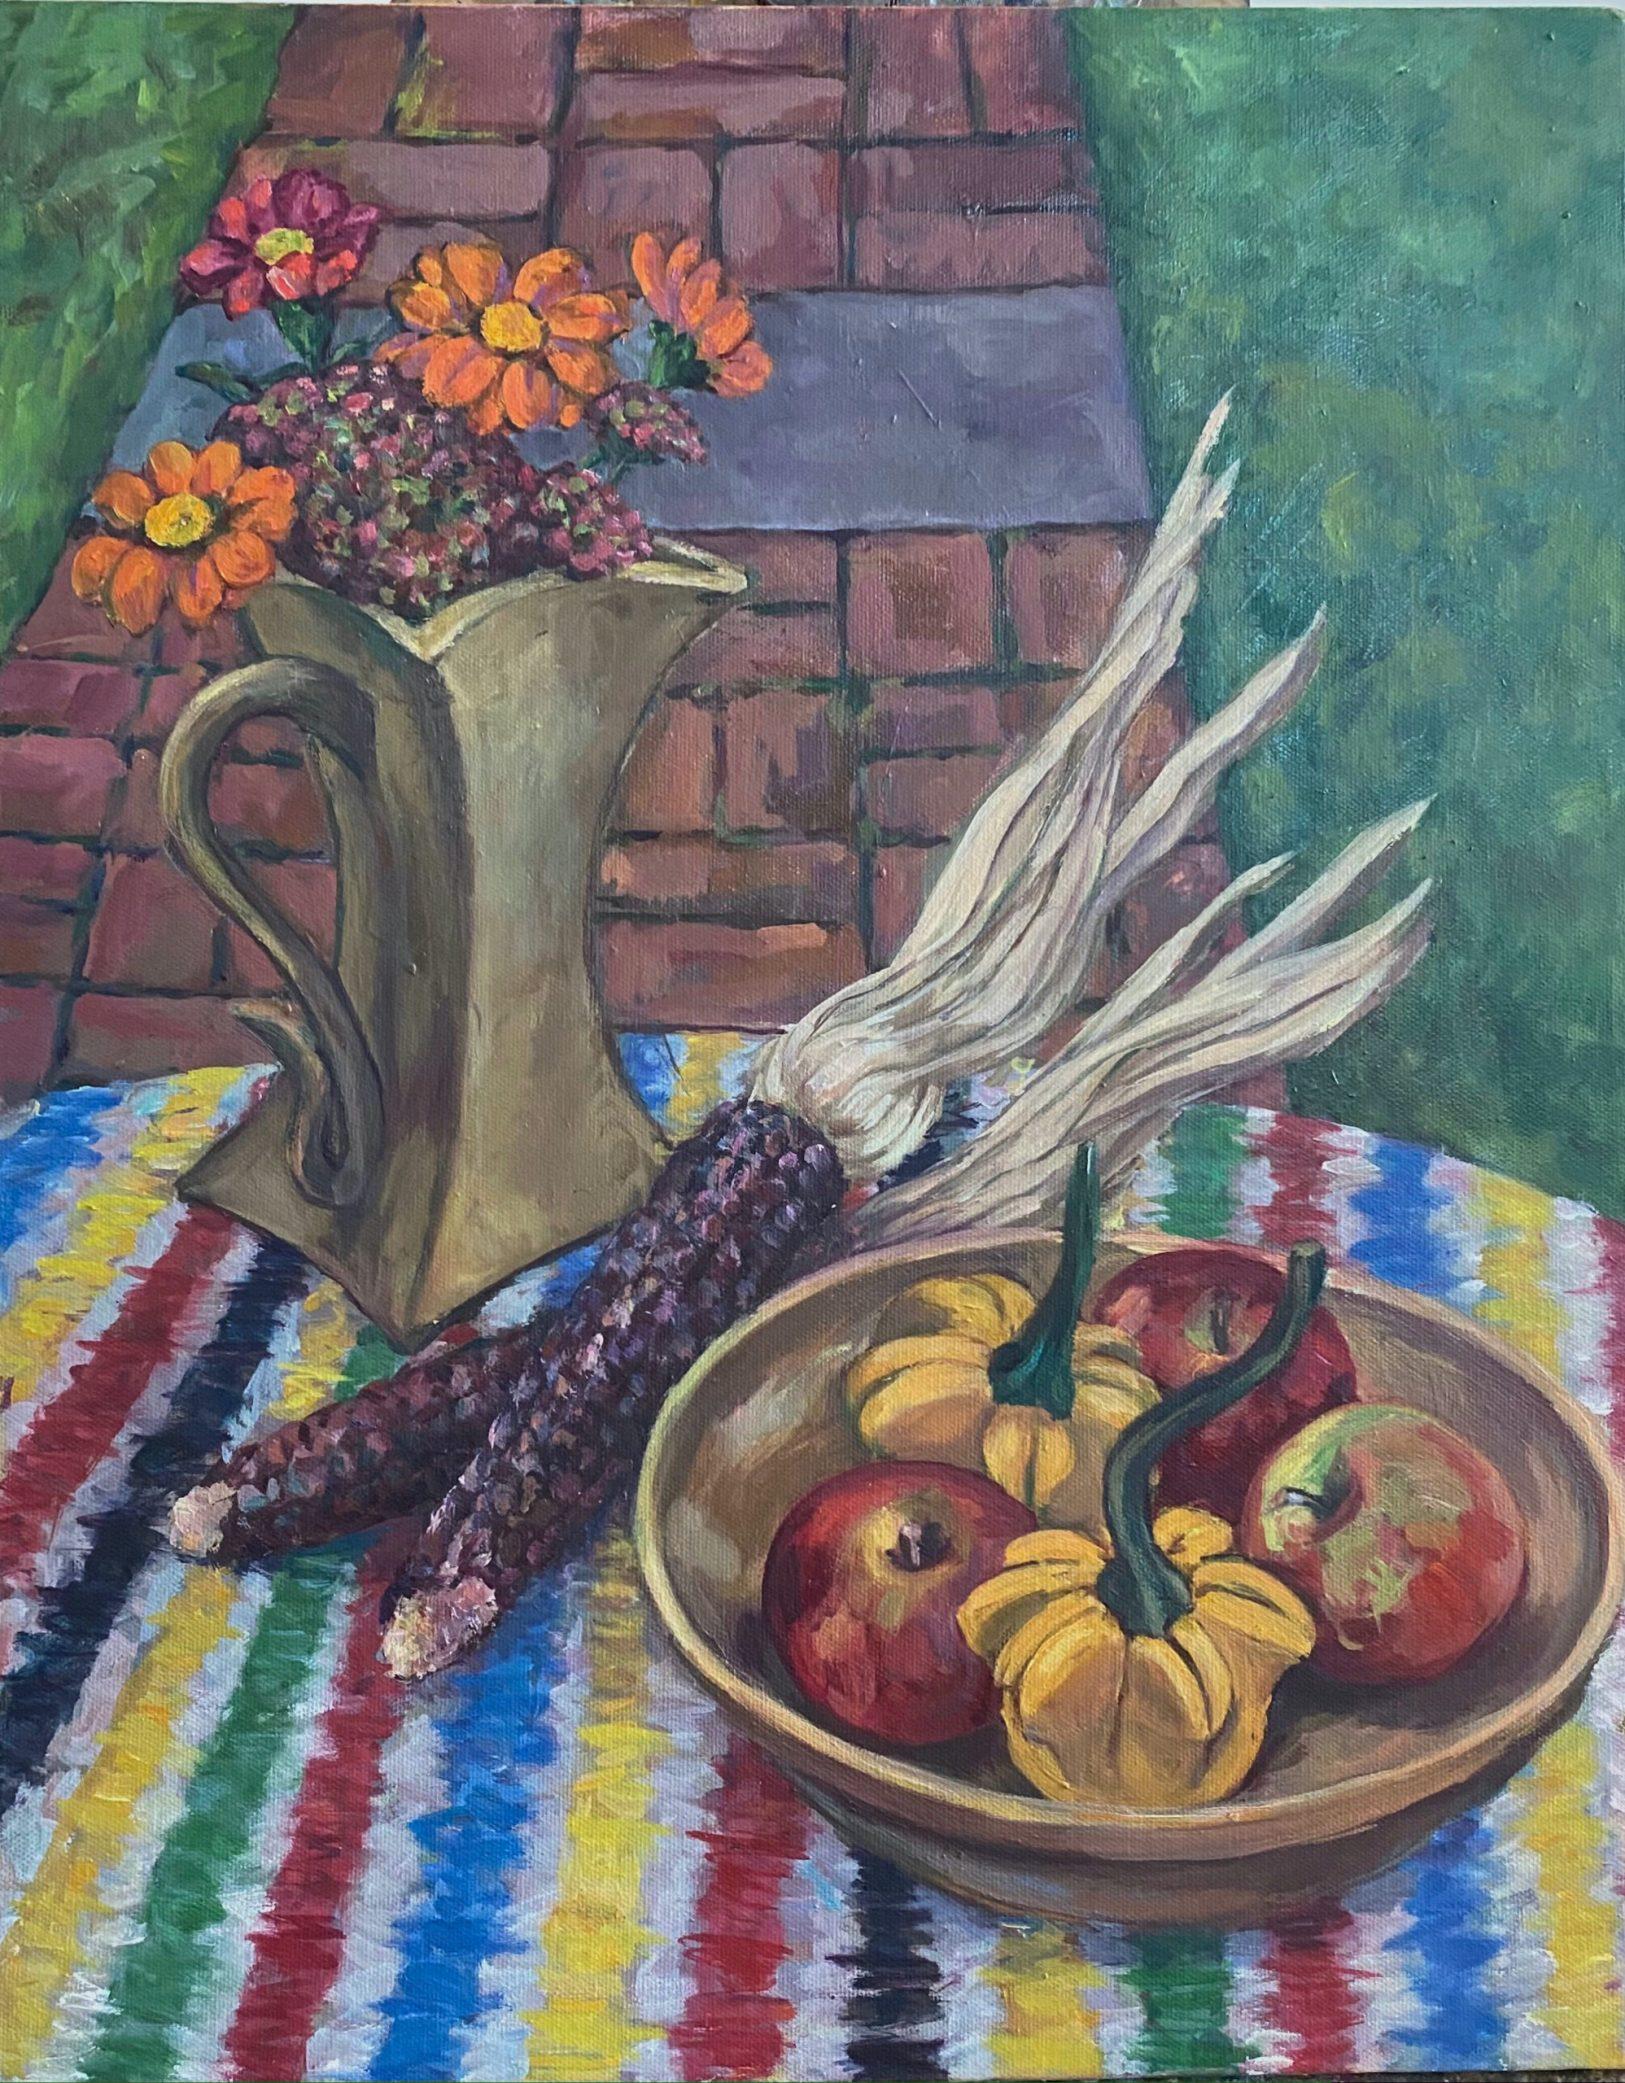 Early Autumn Still Life, oil on canvas, 20